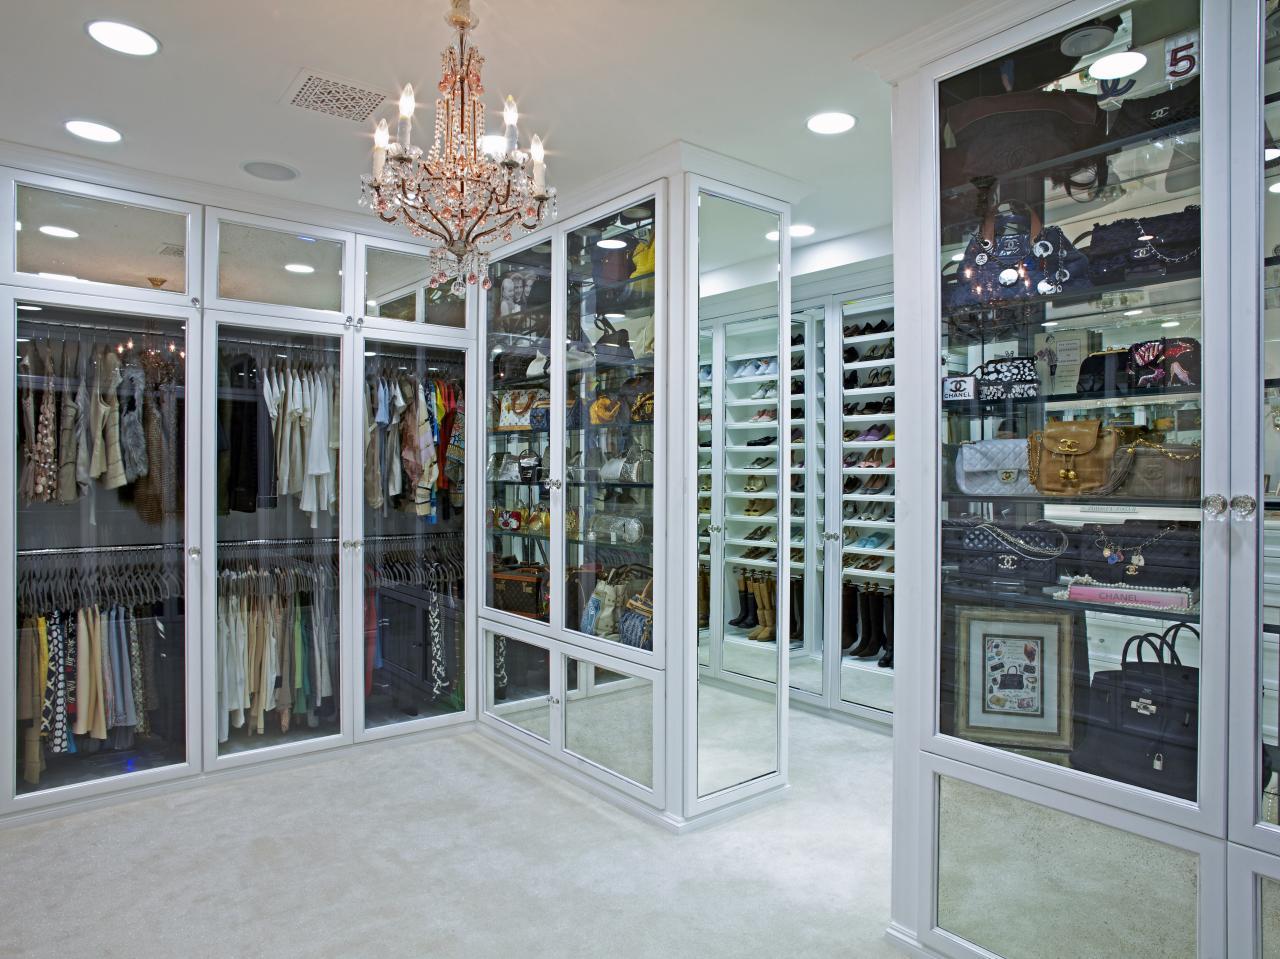 Photos lisa adams hgtv for 10 x 10 closet design